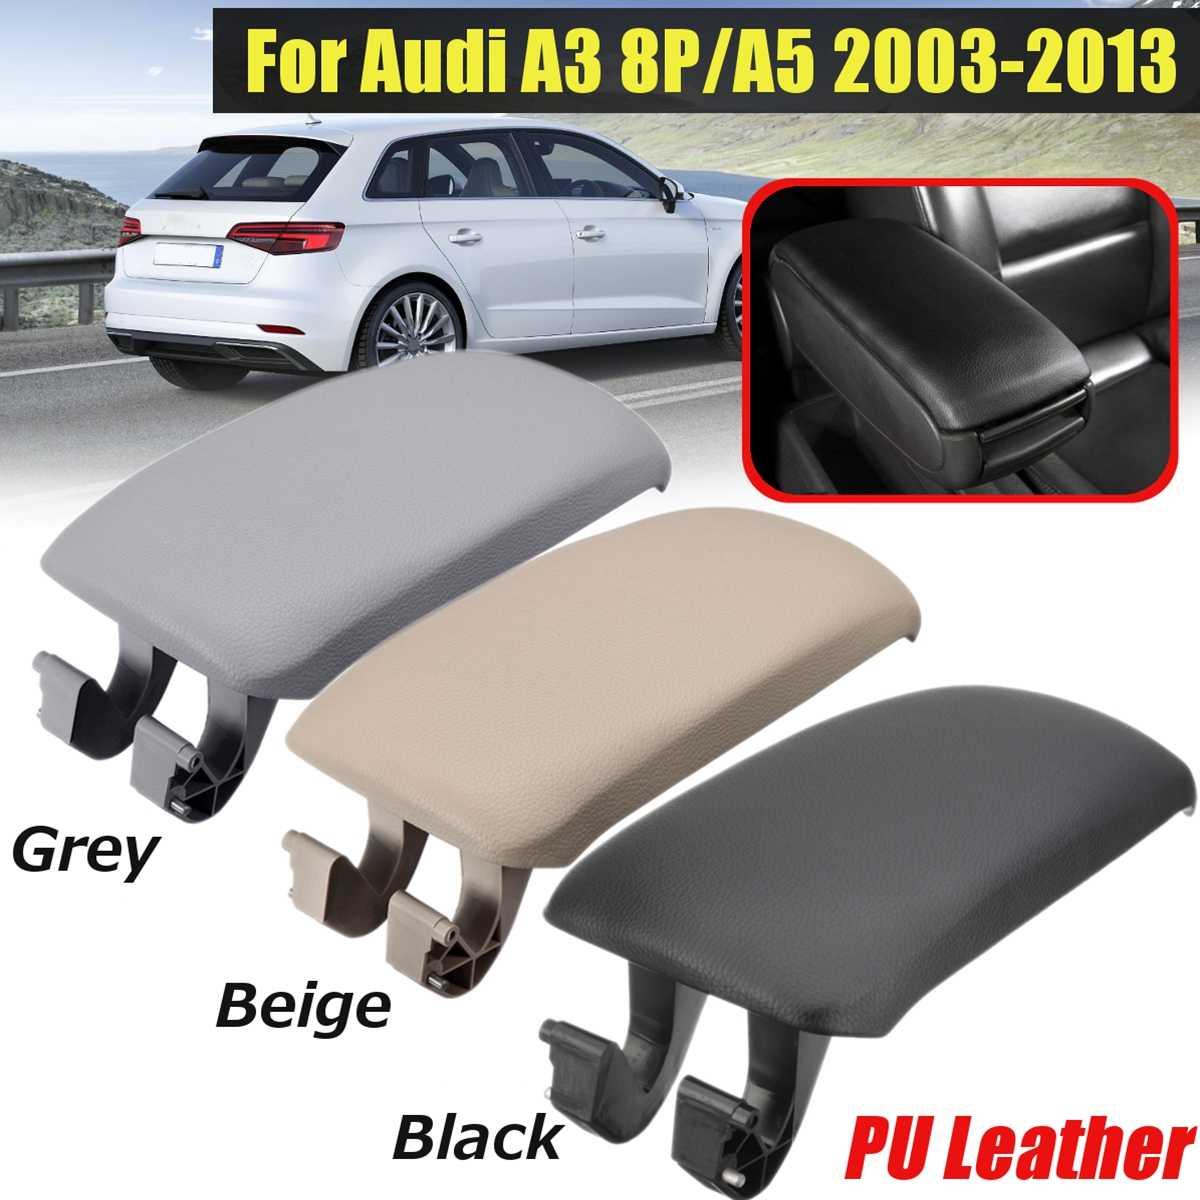 Black Leather Armrest Center Console Arm Rest Cover For Audi A3 03-12 2008 2009